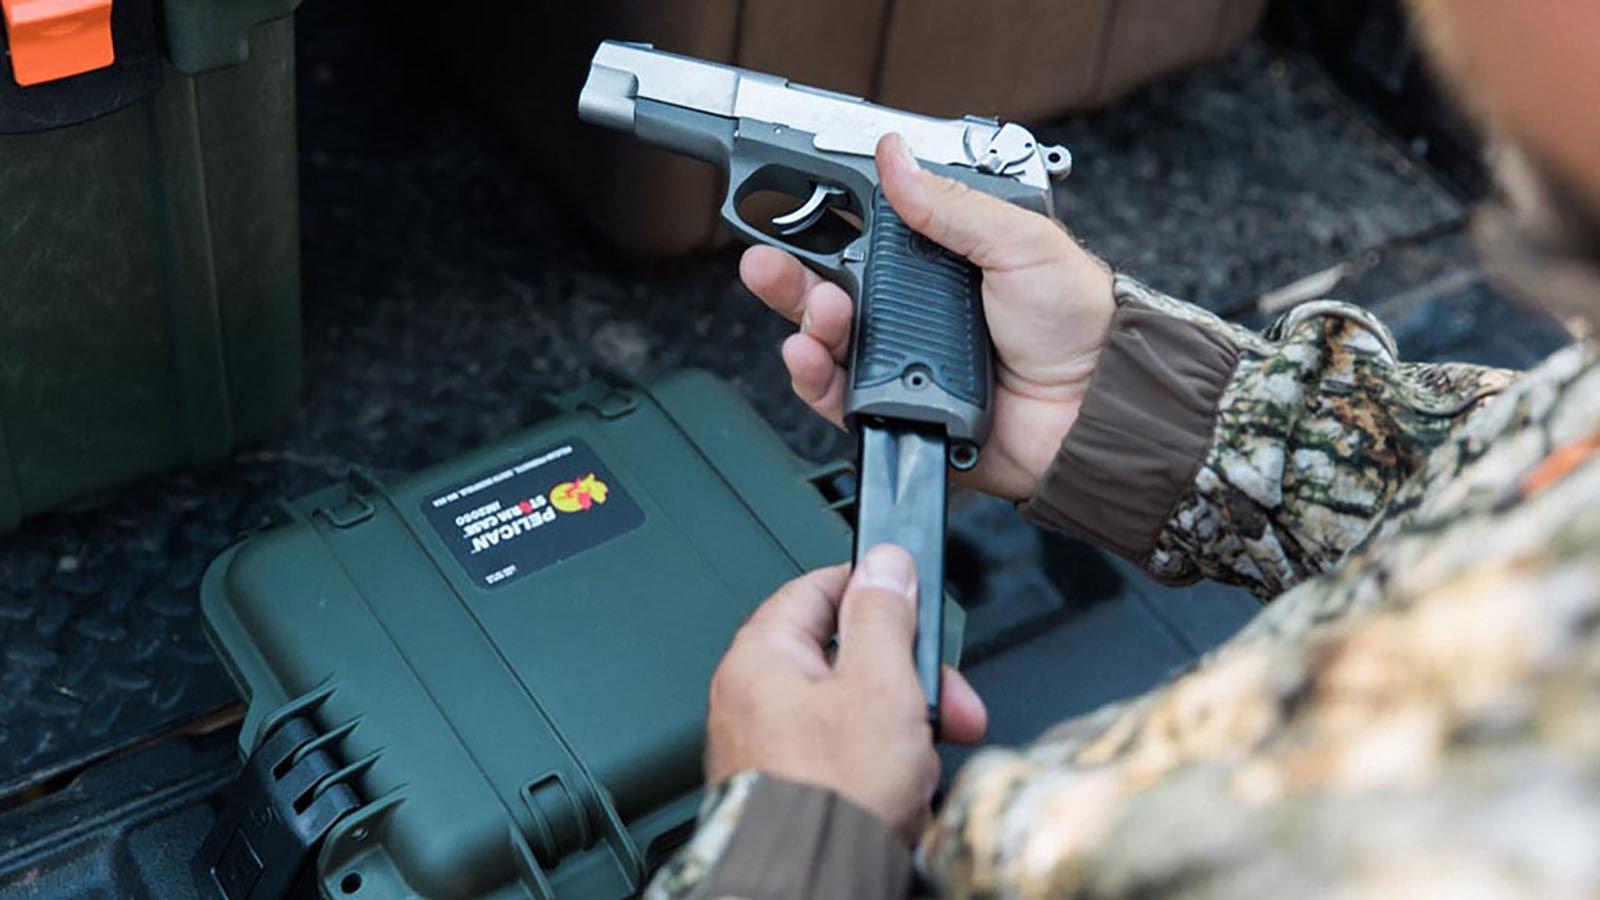 gun with pelican crush proof case